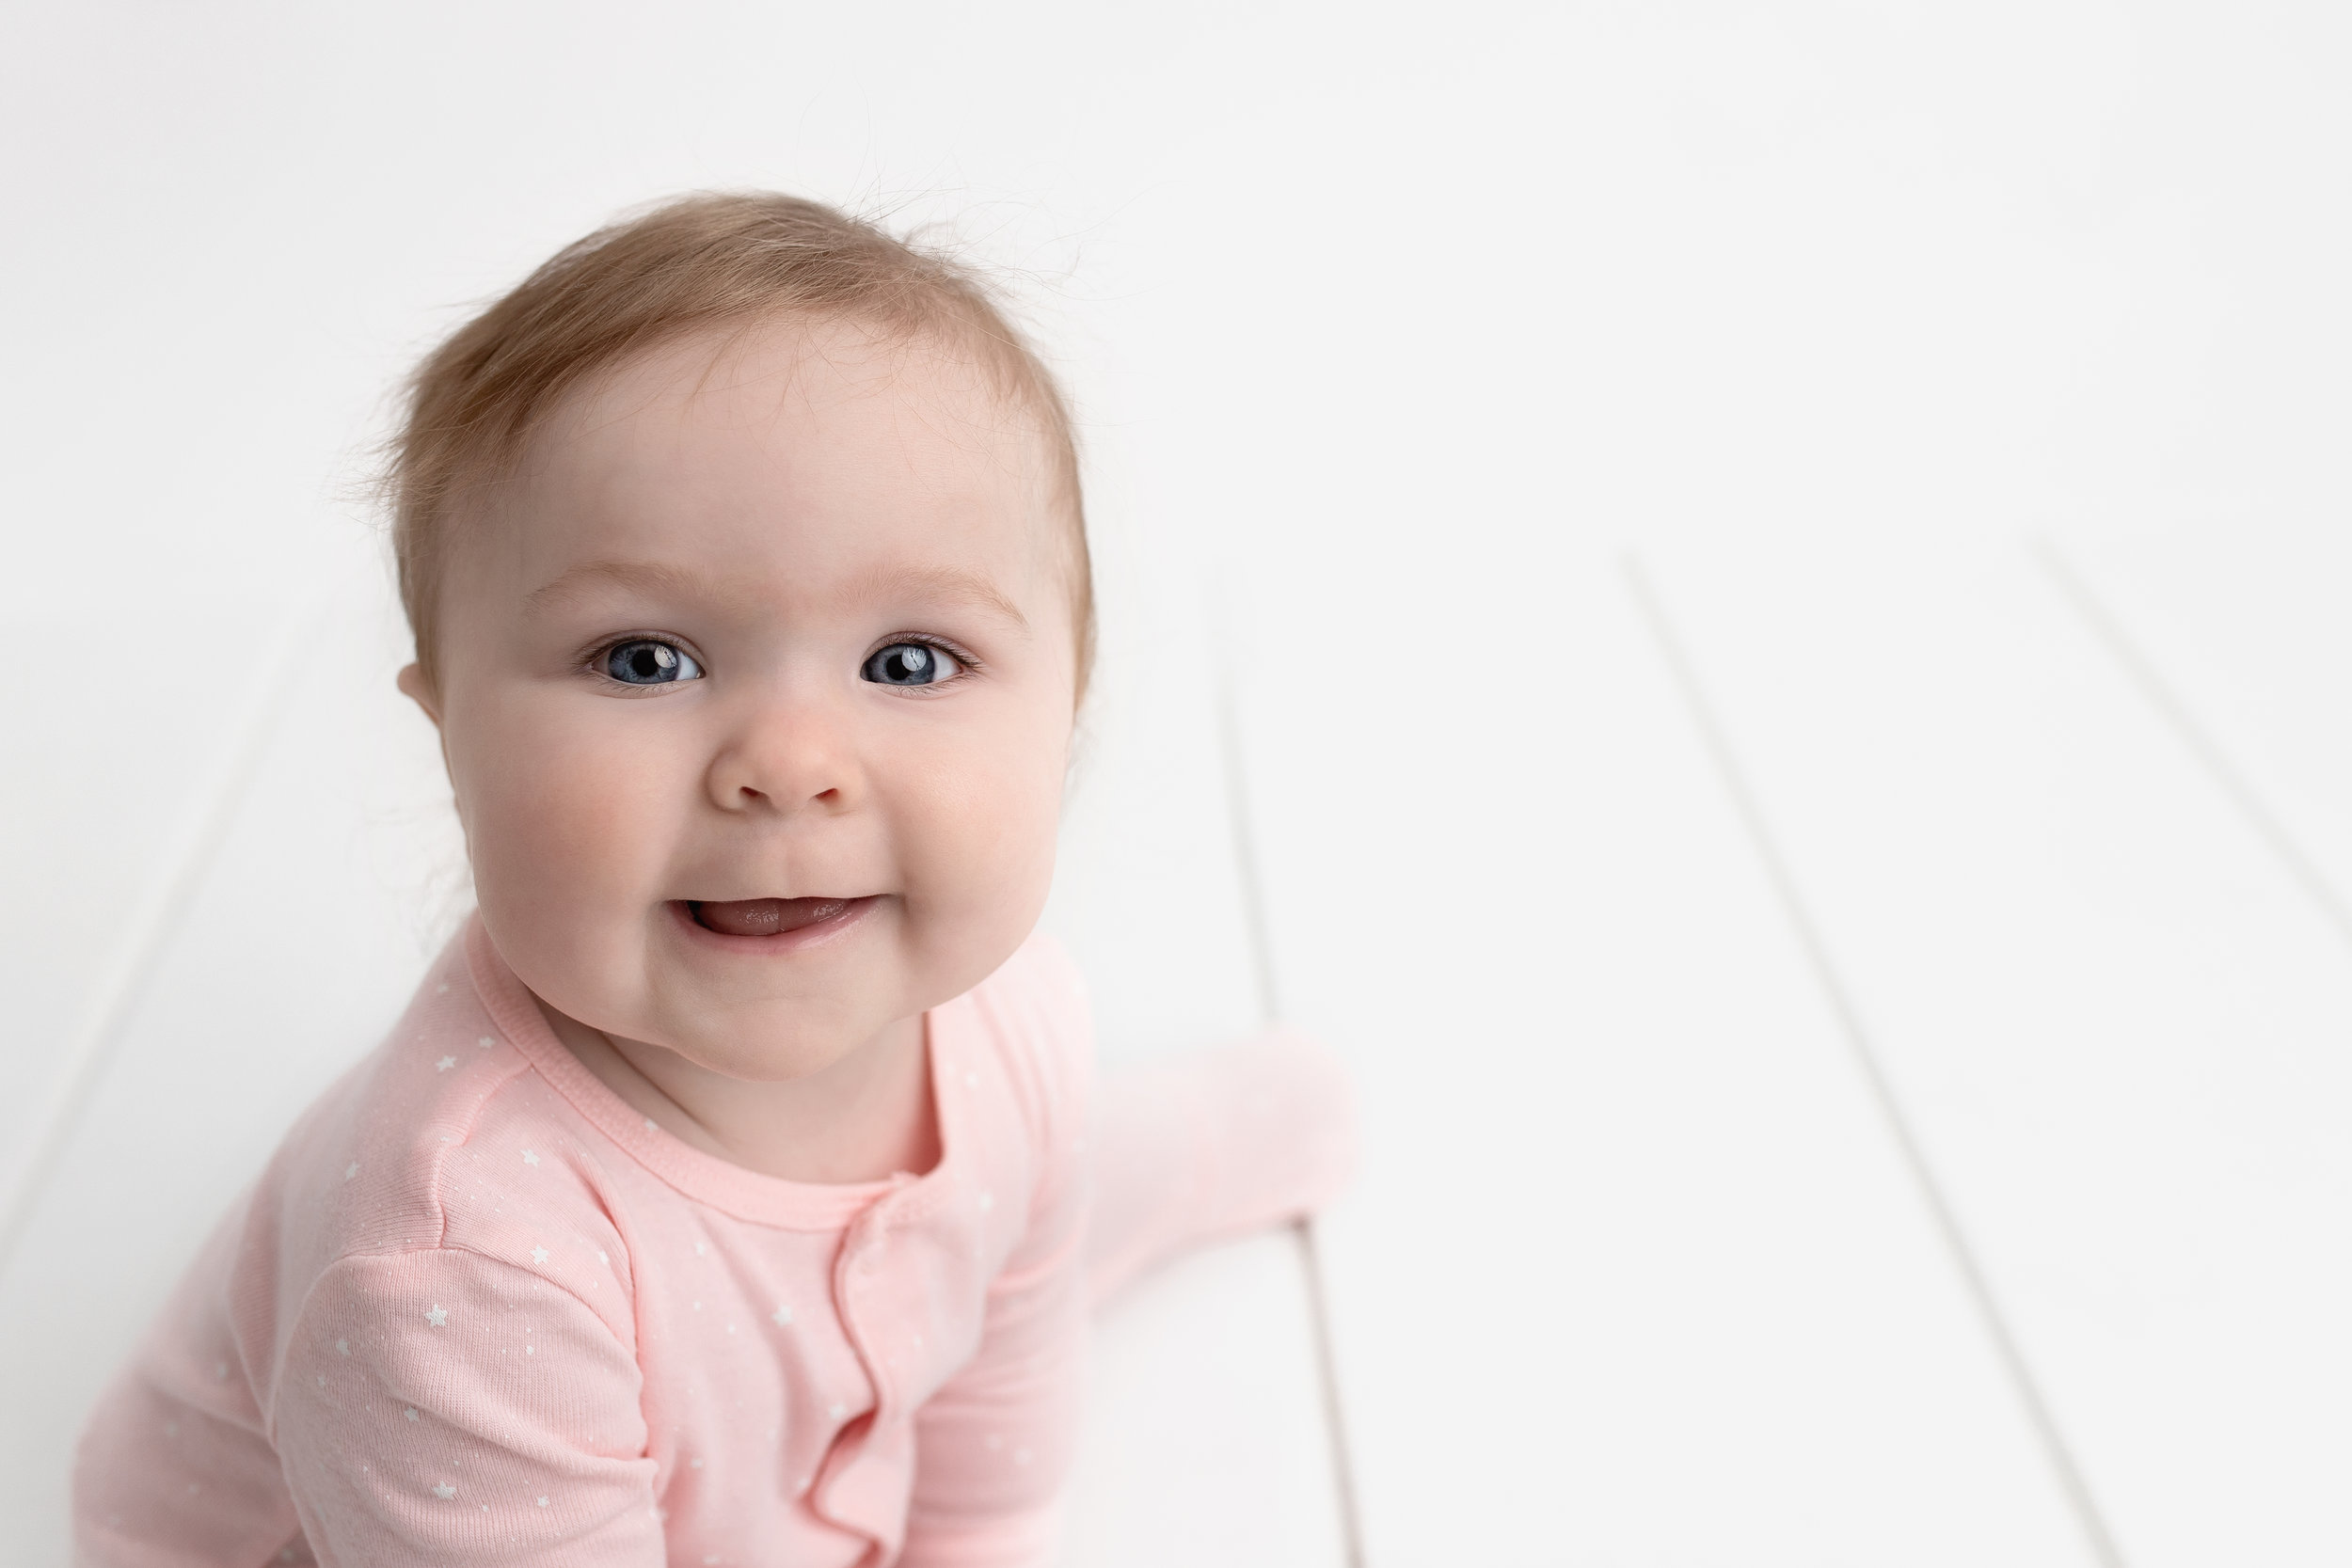 milestone session baby photo session baby photographer edmonton 7 months old baby images photoshoot st-albert